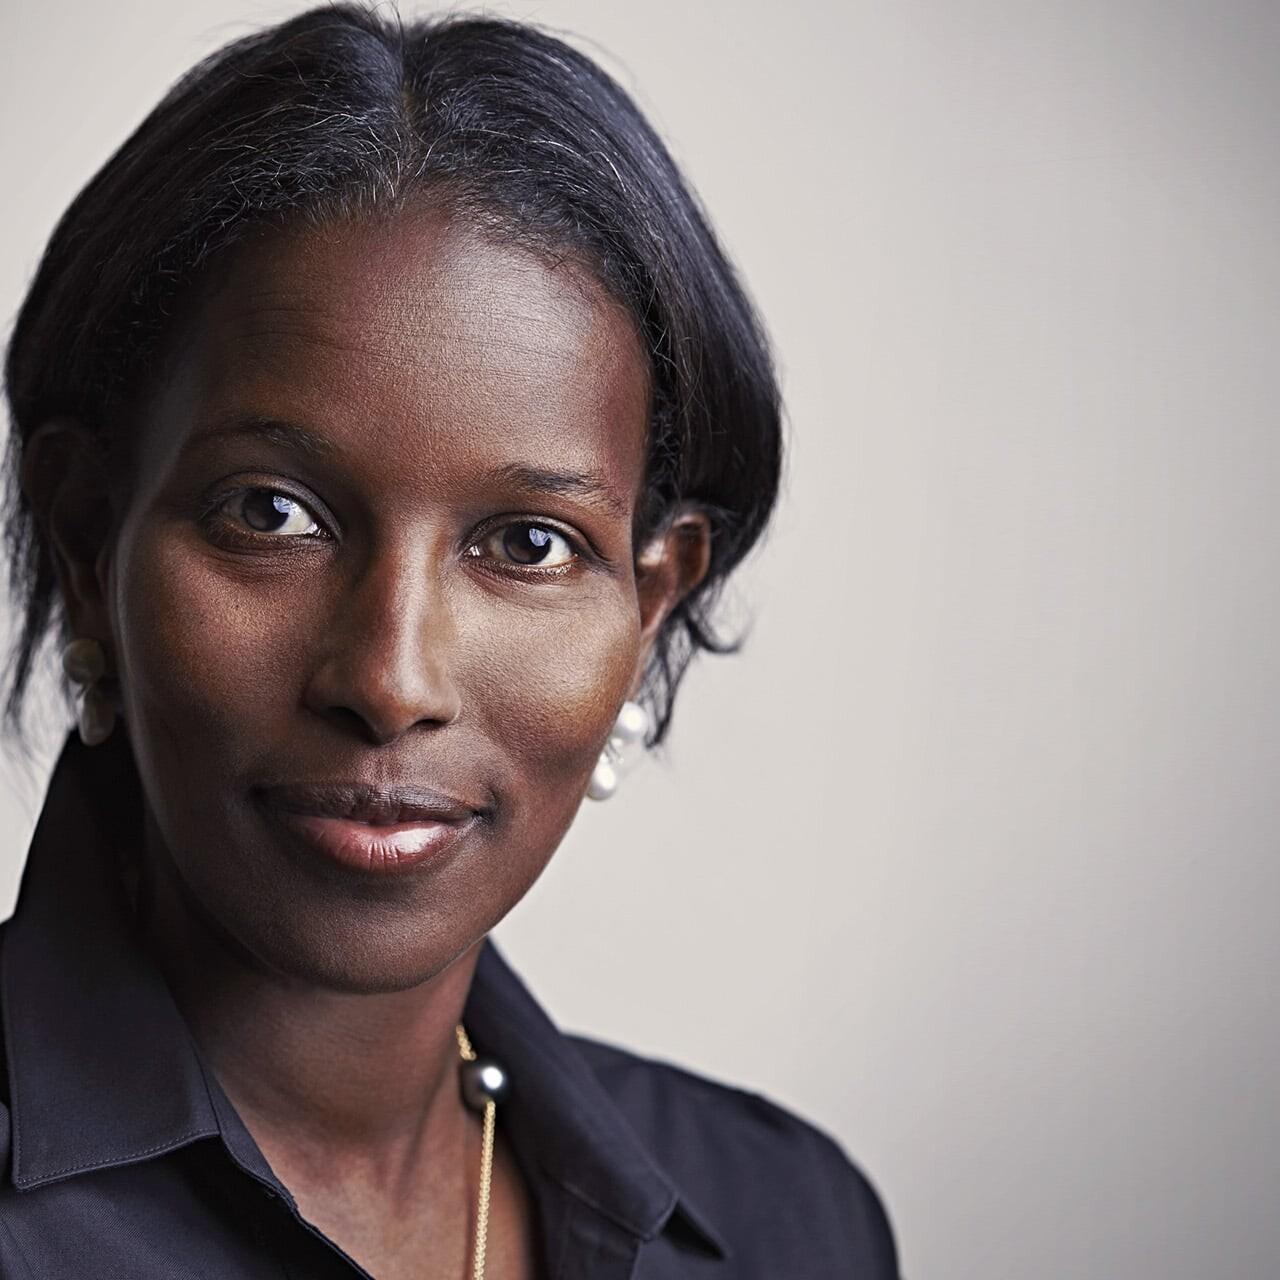 Europa e Islam radicale: intervista ad Ayaan Hirsi Ali